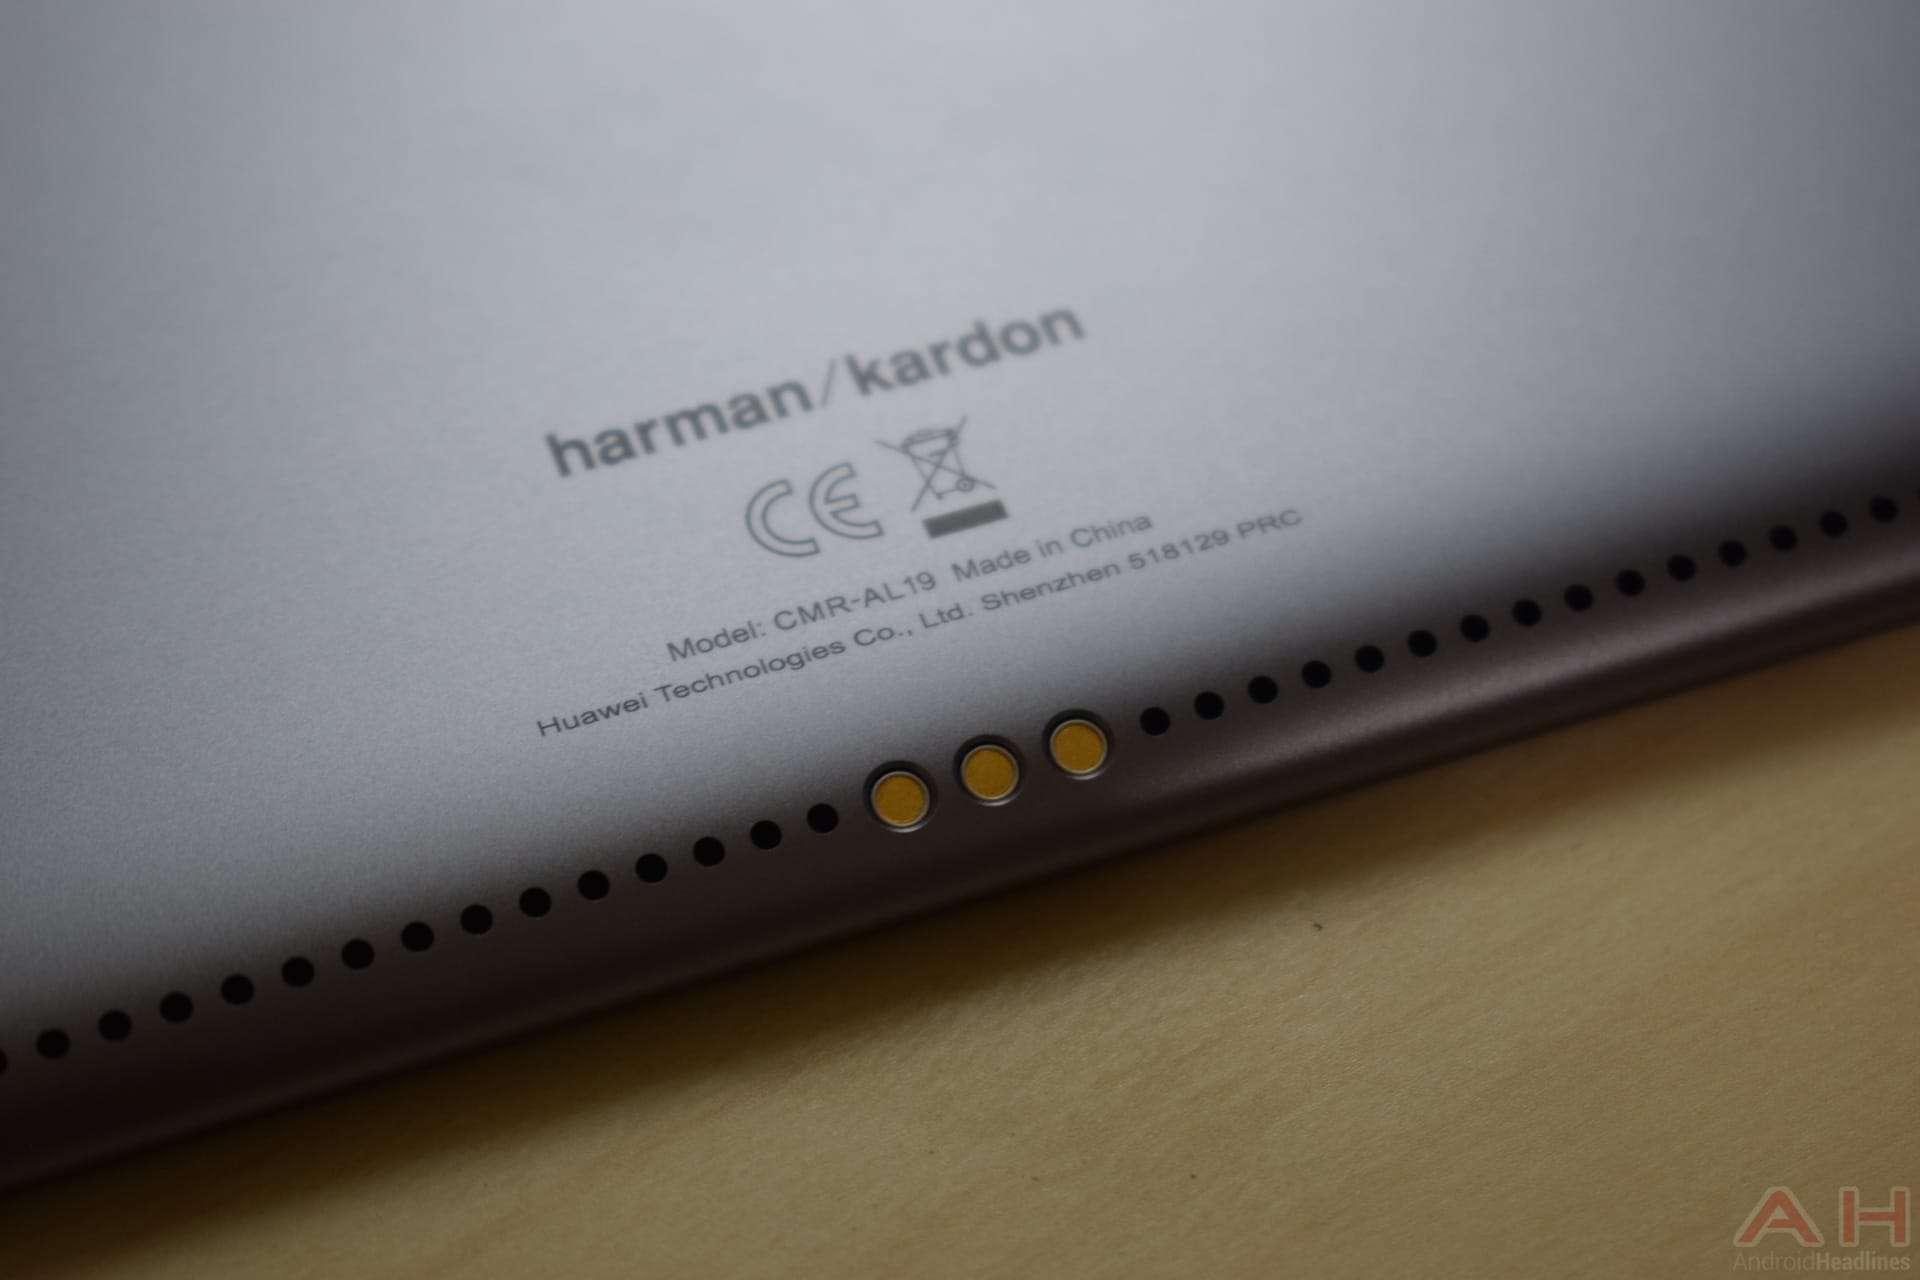 Huawei MediaPad M5 Review AM AH 5